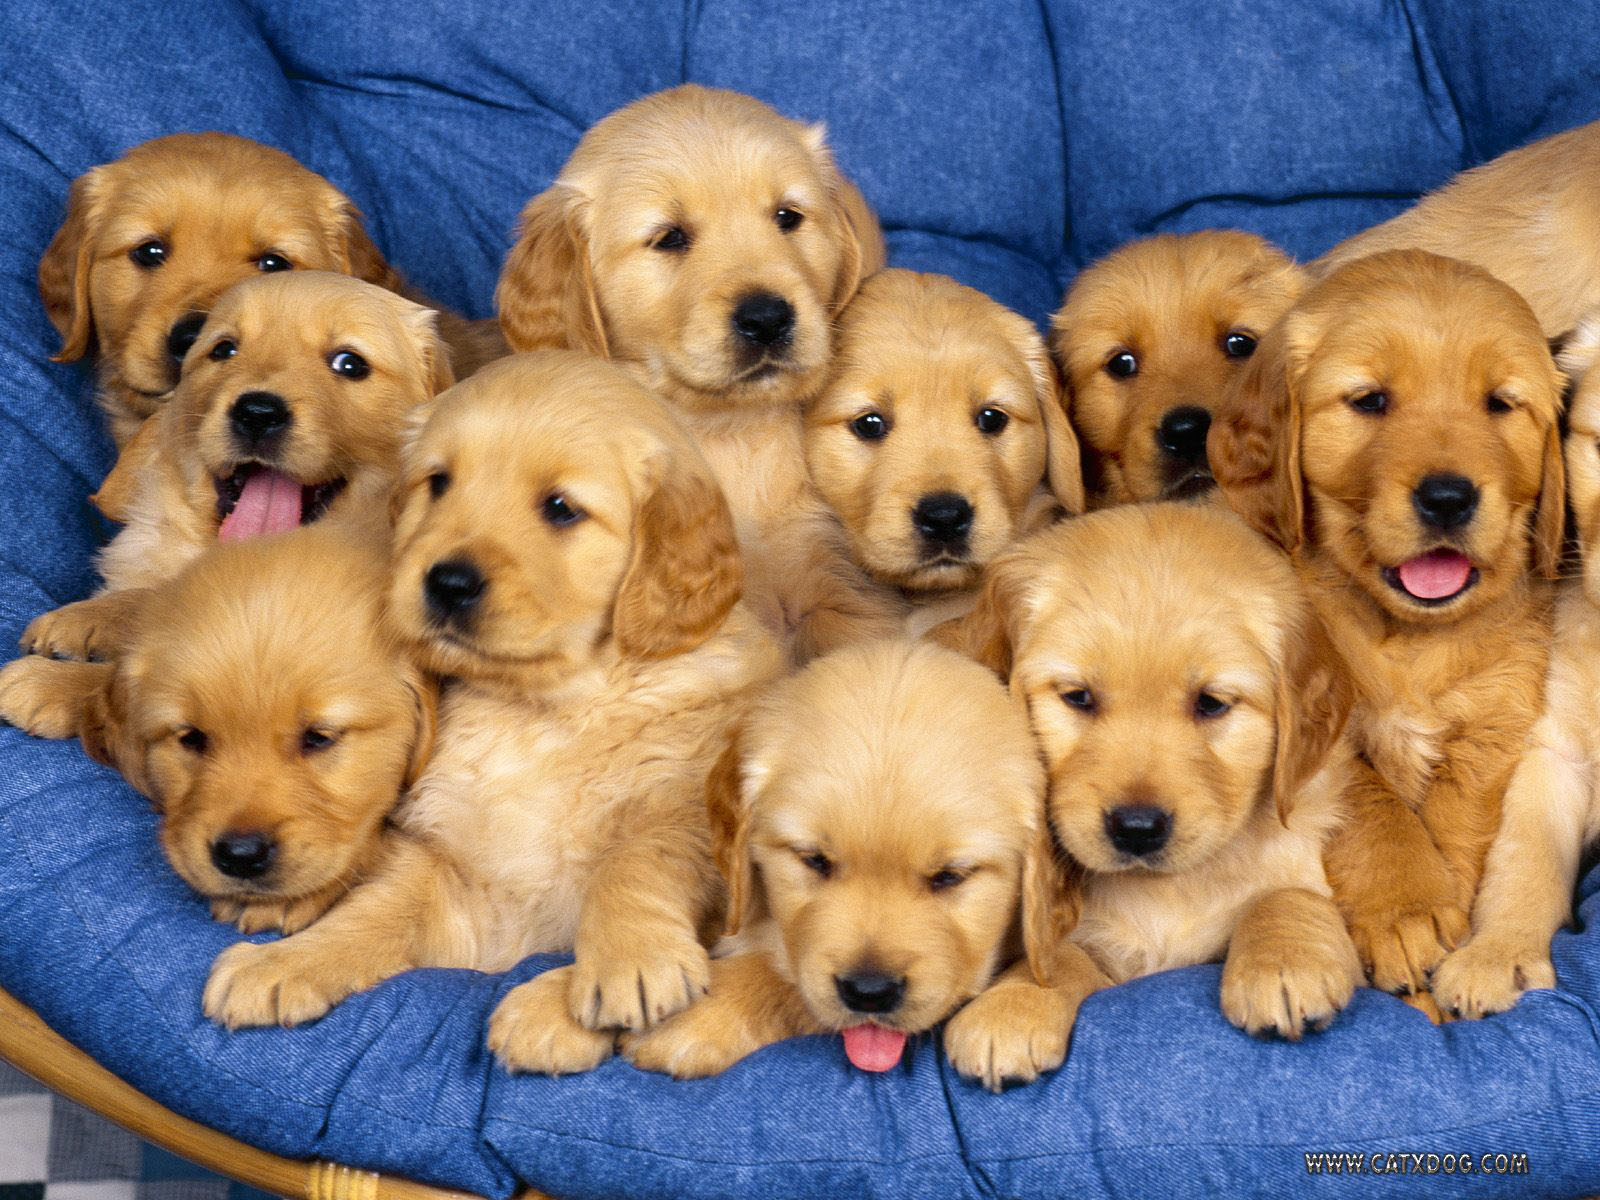 Training puppies chewing gum